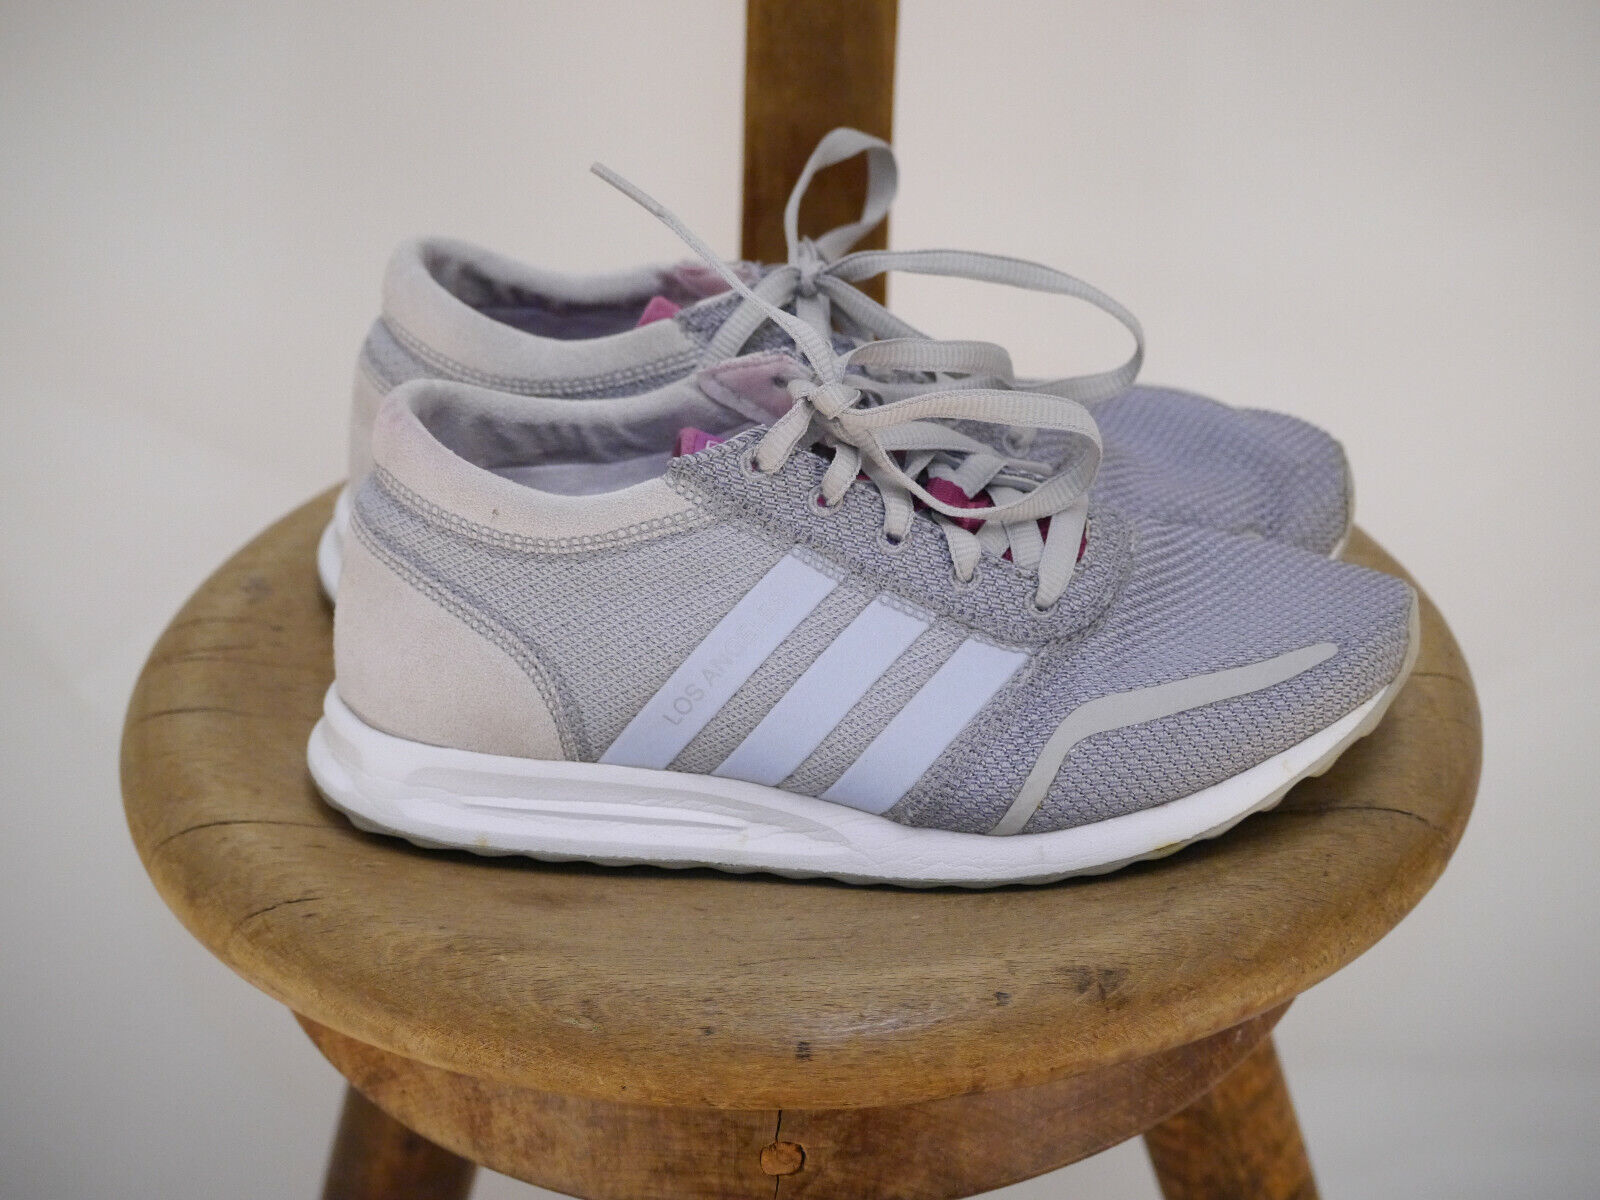 Adidas Sneaker Los Angeles Damen Test Vergleich +++ Adidas ...